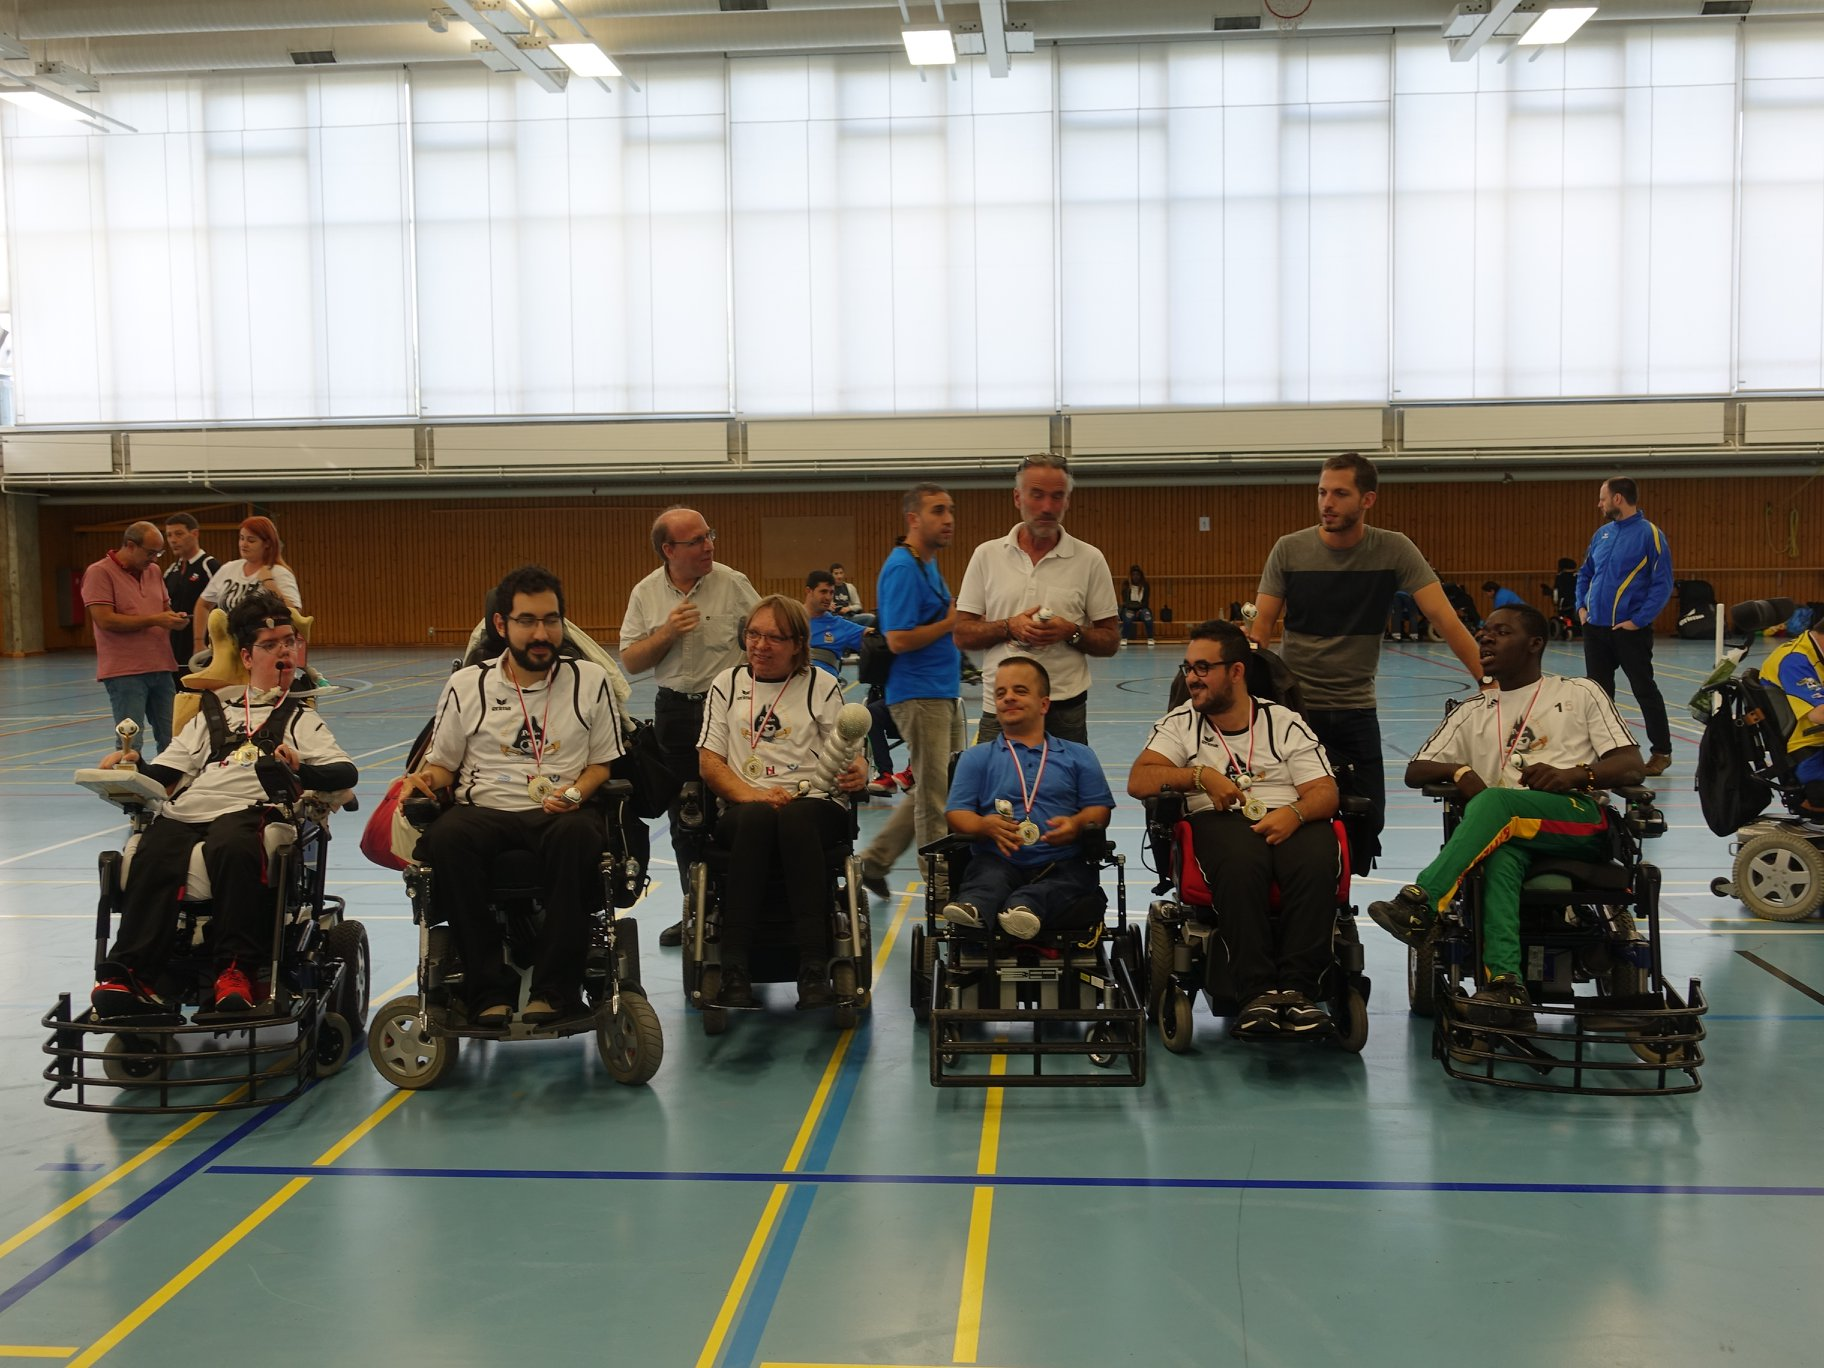 Geneva's_Cup_17_21_équipe_genève